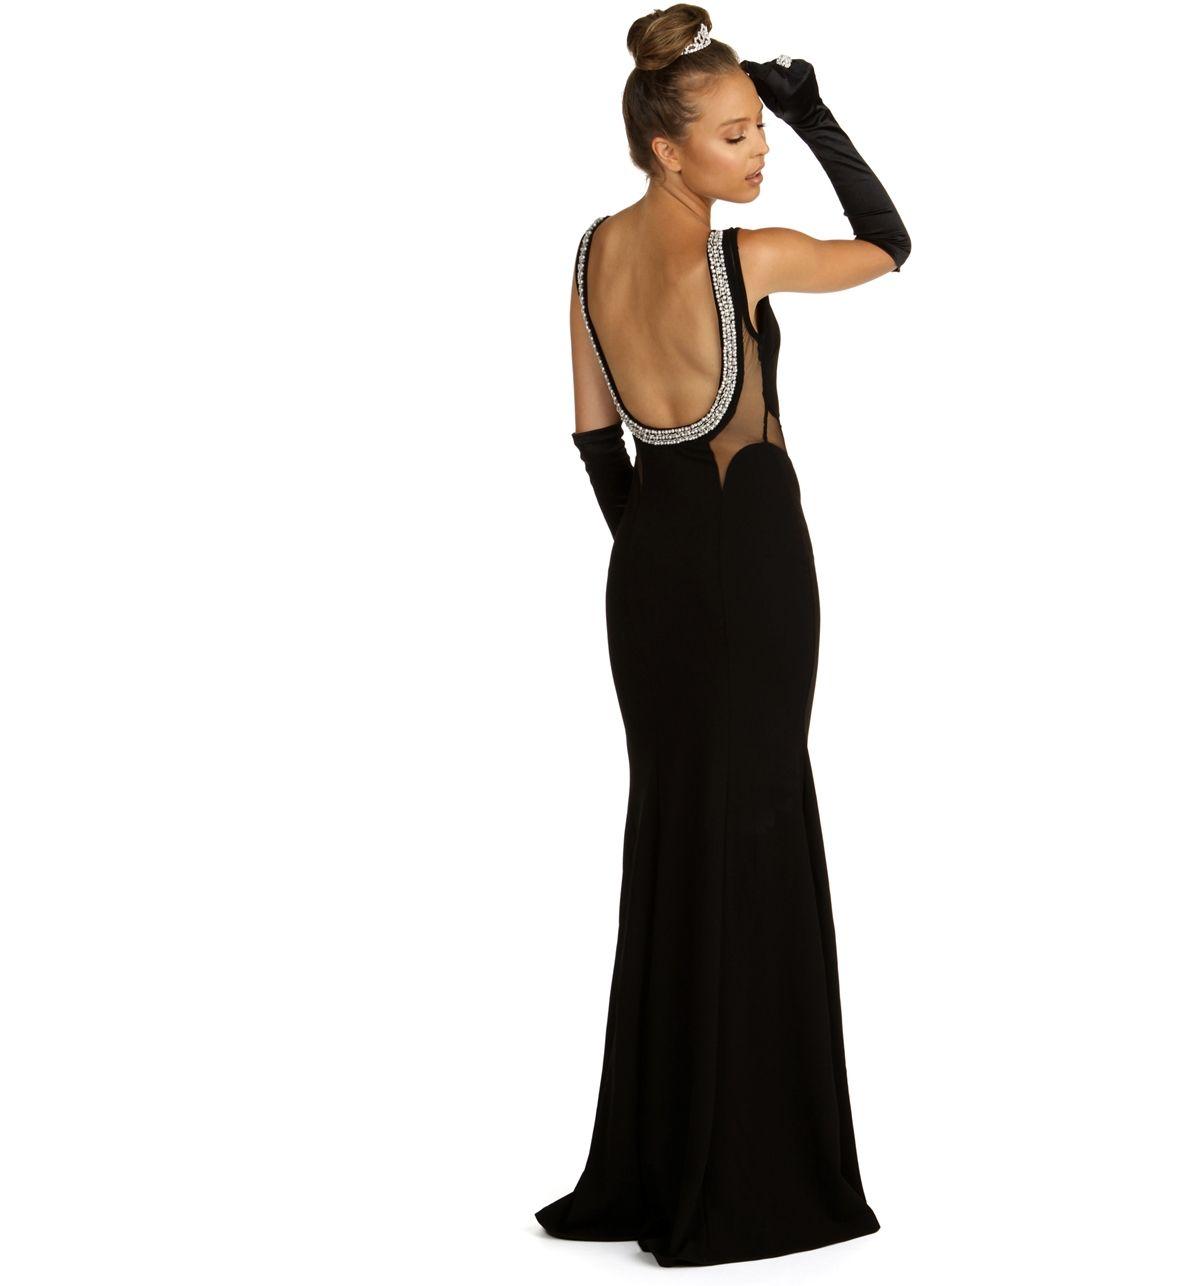 Tamara Black Beaded Back Prom Dress Prom Dresses Black Prom Dress Necklines For Dresses [ 1286 x 1180 Pixel ]